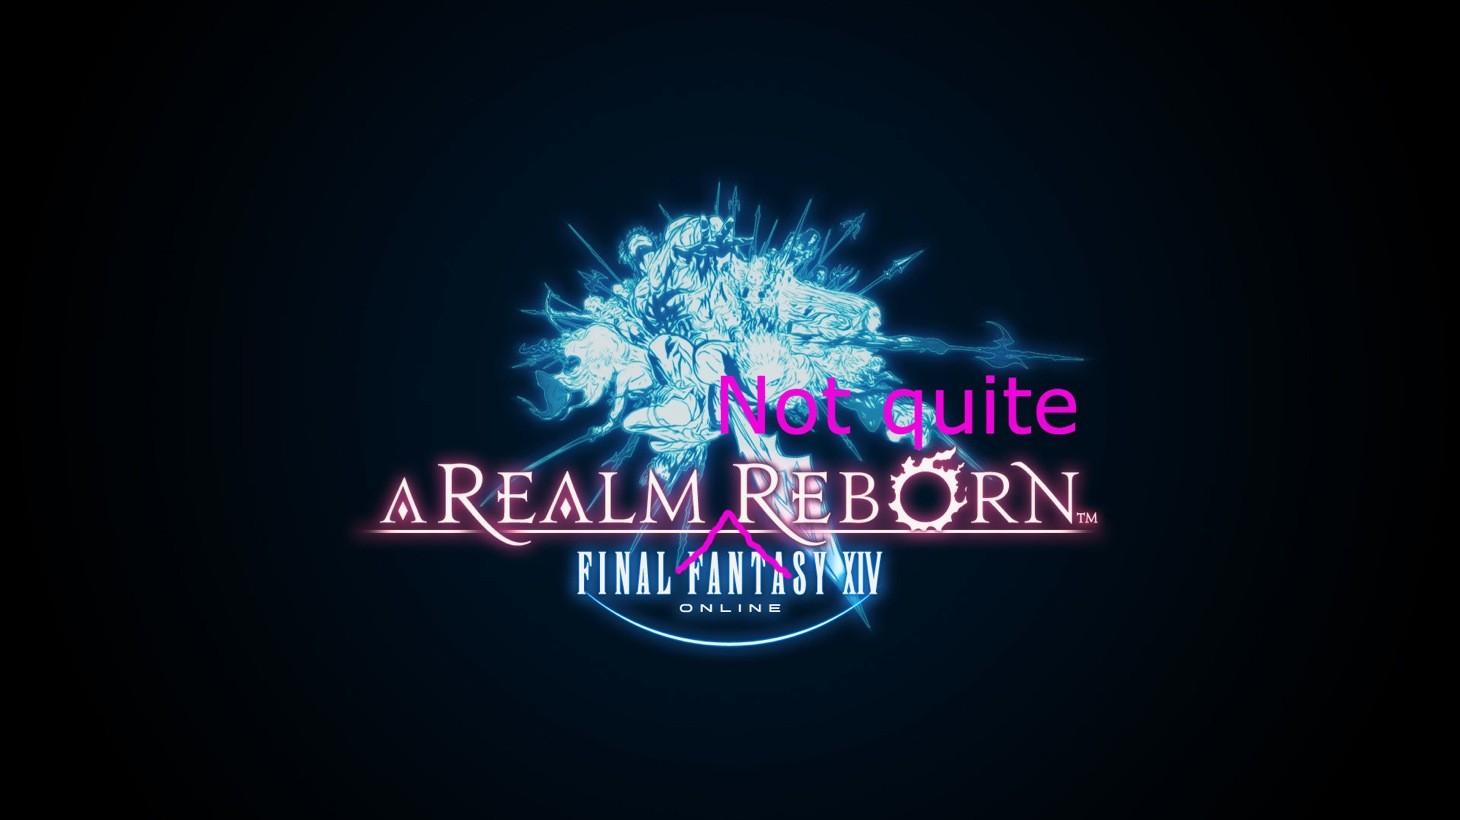 wpid-not-quite-reborn.jpg